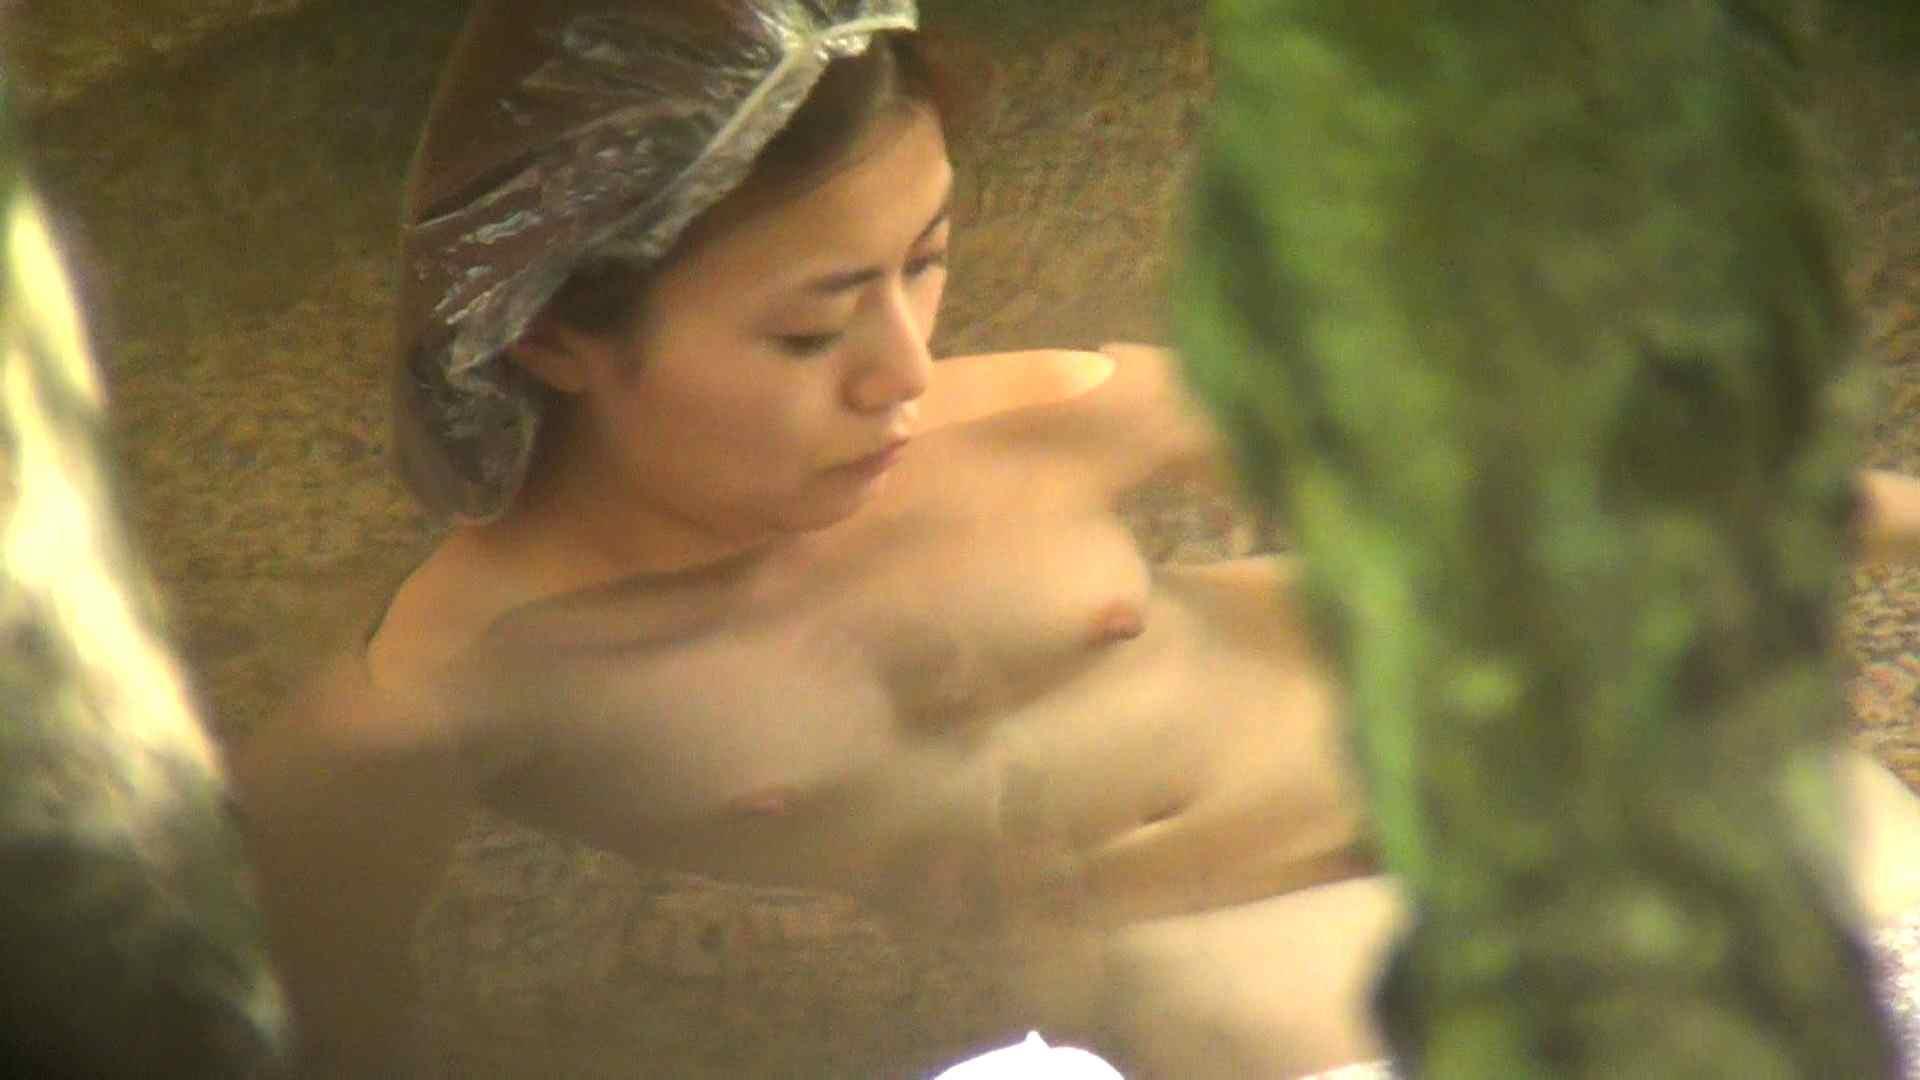 Aquaな露天風呂Vol.264 美しいOLの裸体   露天風呂突入  99pic 25